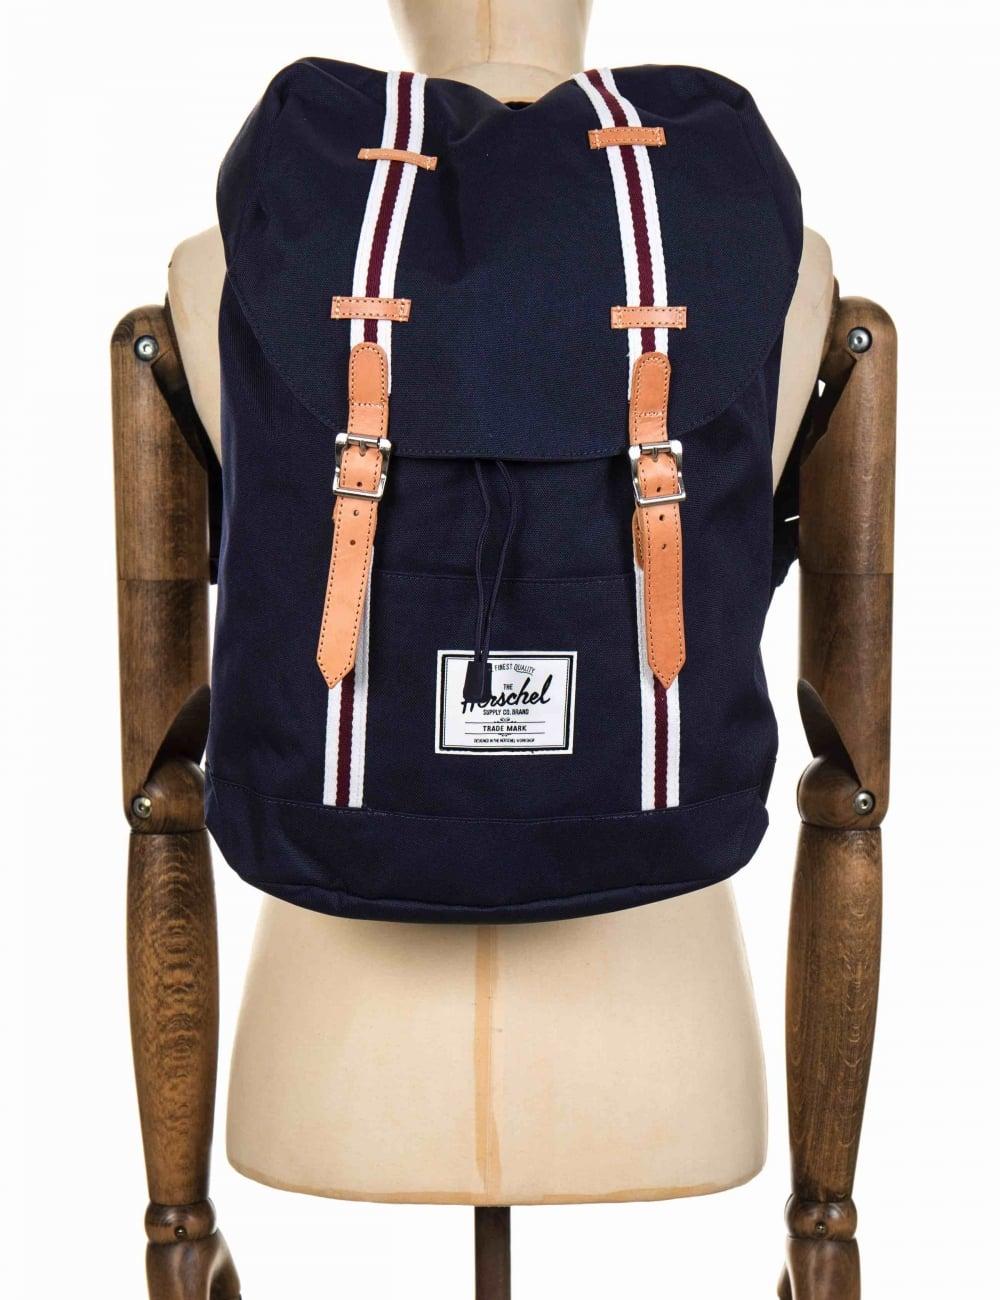 3321370d1c Herschel Supply Co Retreat 19.5L Backpack - Peacoat/White/Windsor Wine